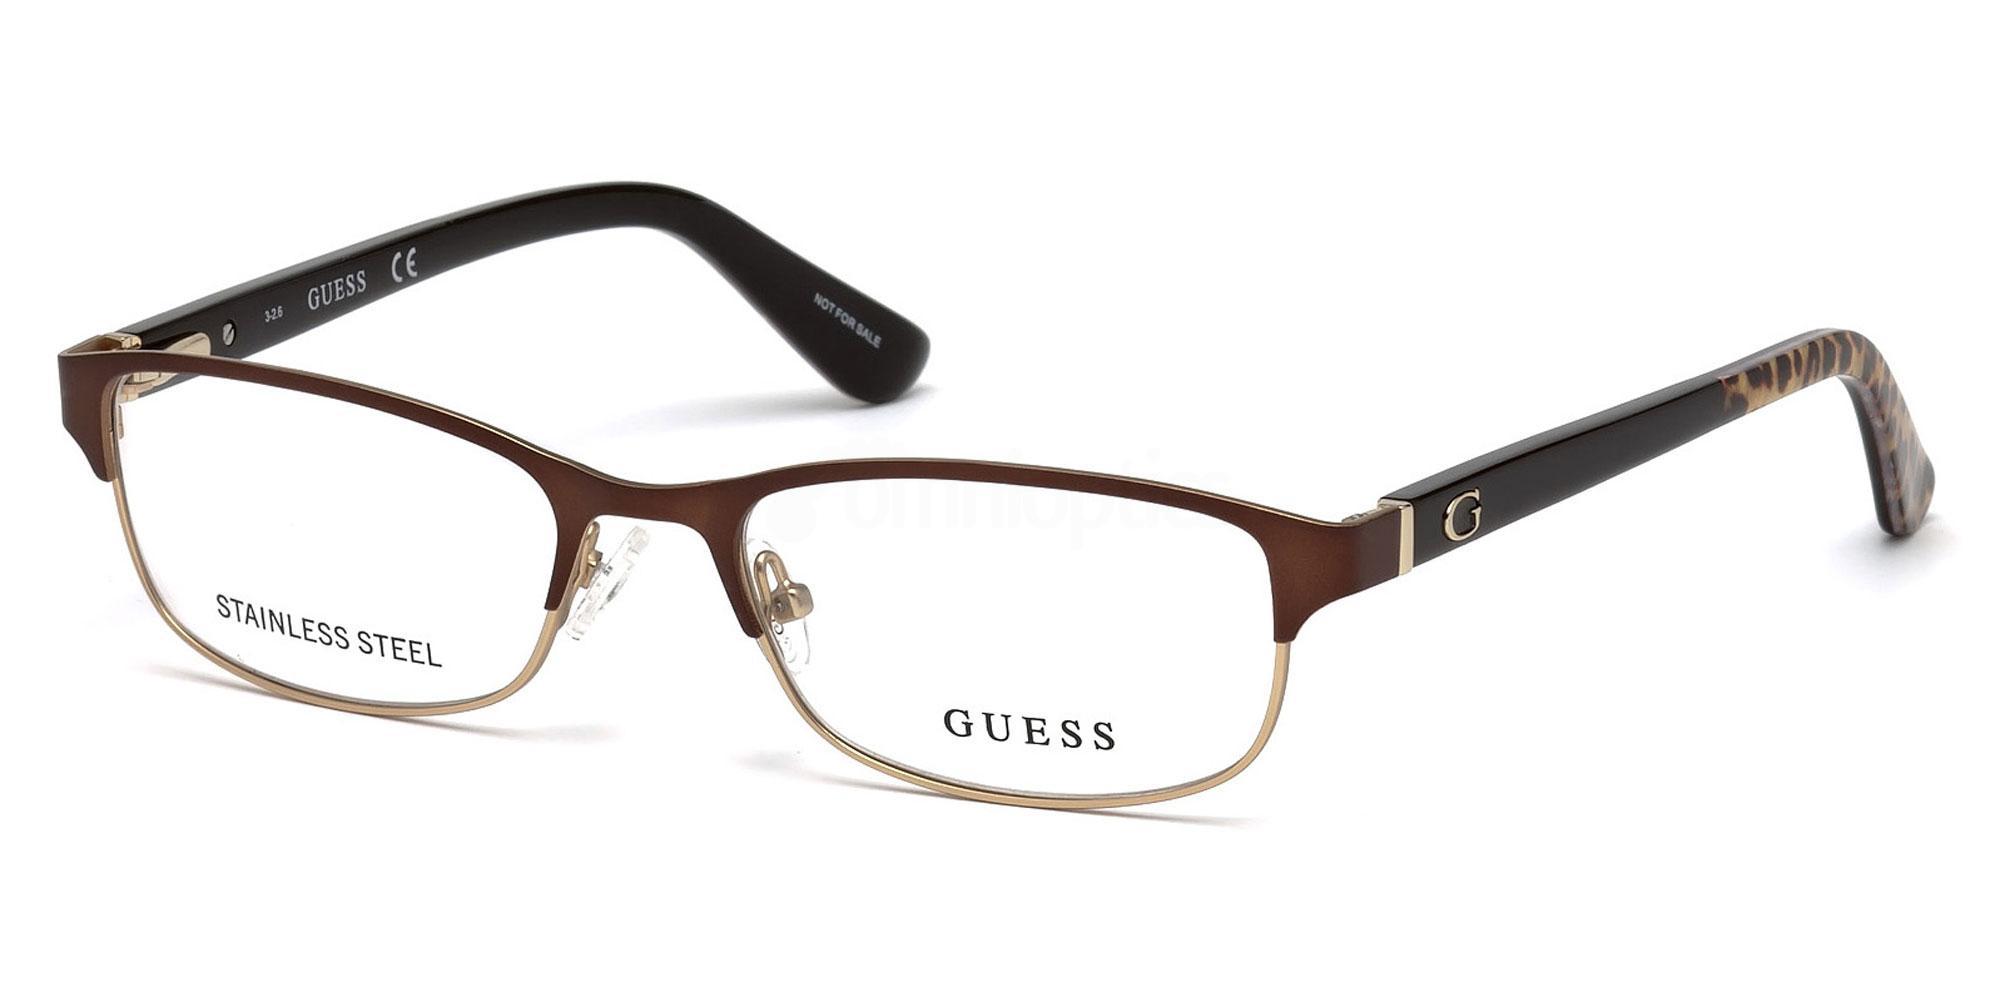 049 GU2614 , Guess